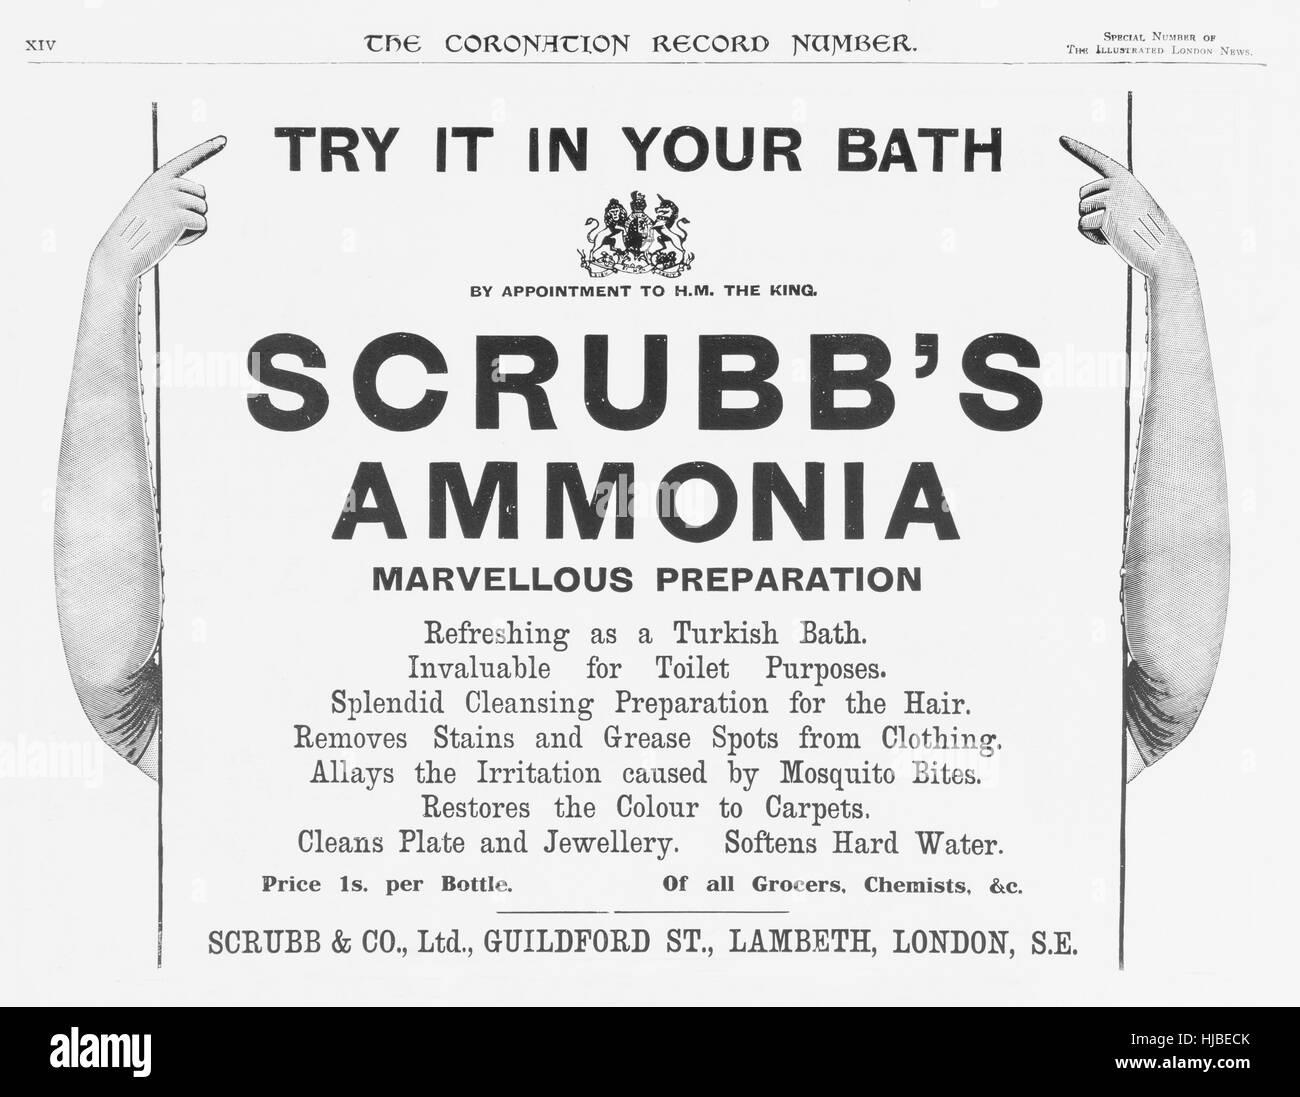 Scrubb's Ammonia advert in The Illustrated London News, 1911 Stock